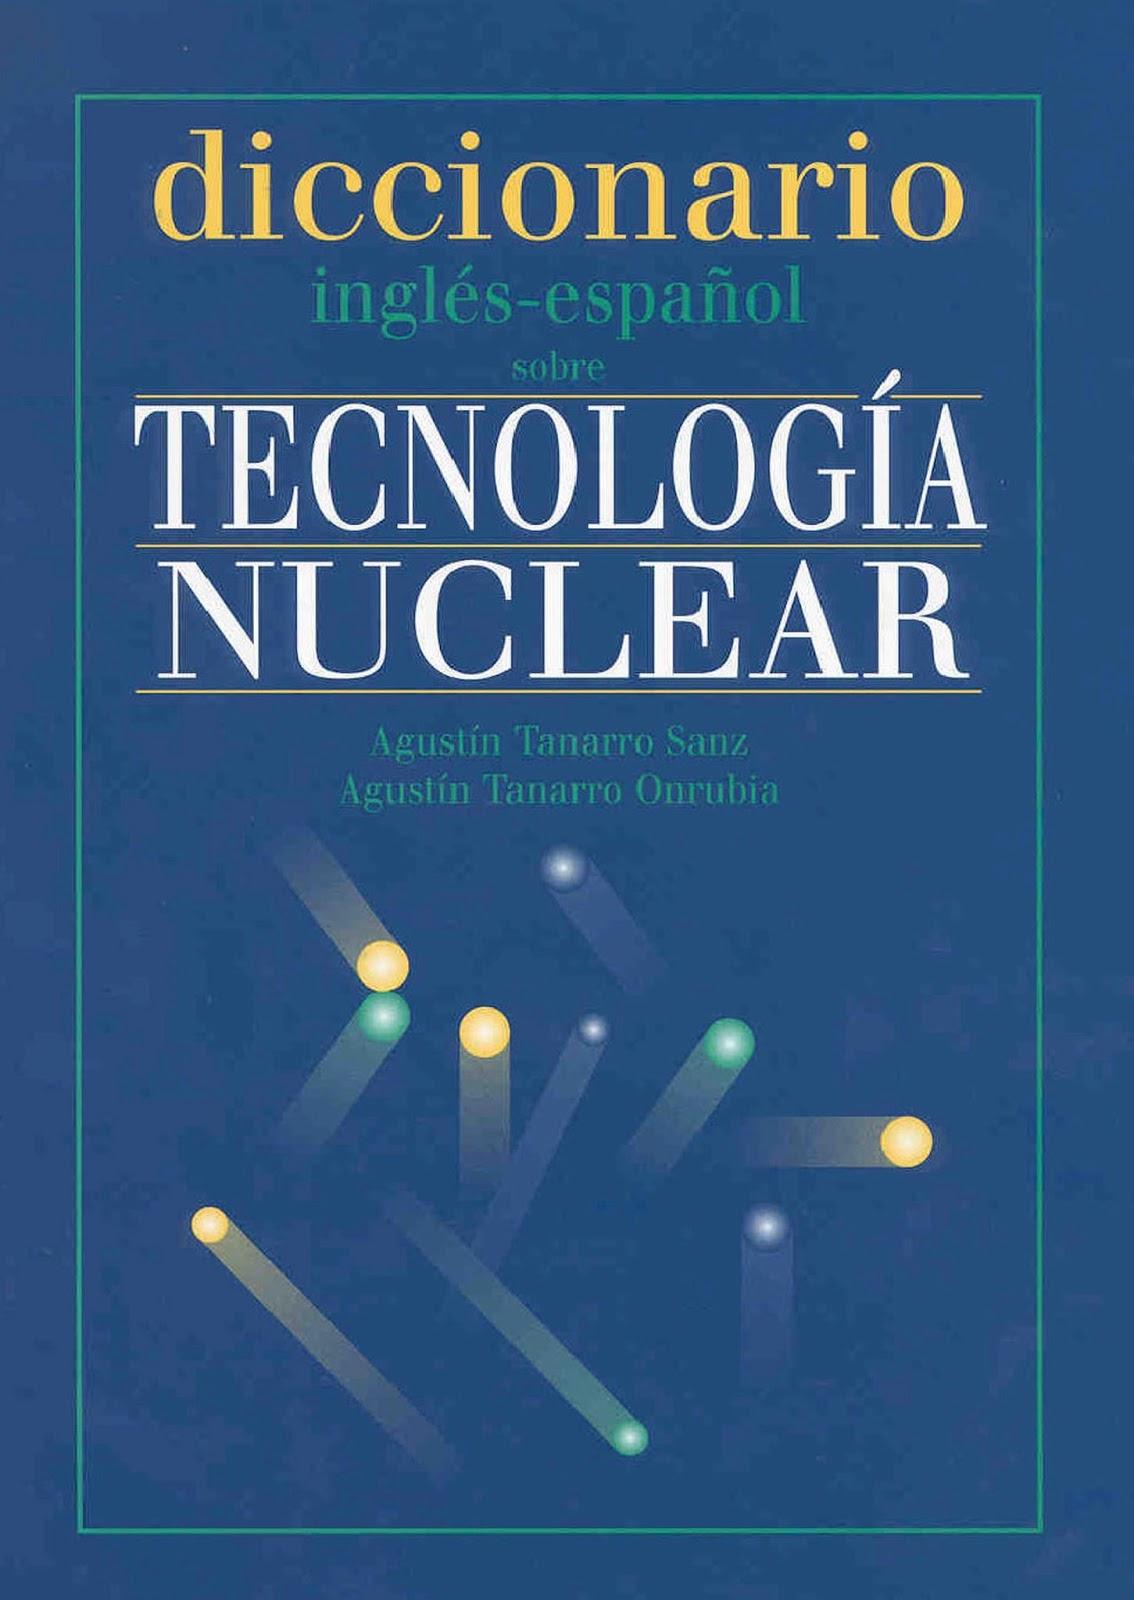 Diccionario inglés-español sobre tecnología nuclear – Agustín Tanarro Sanz